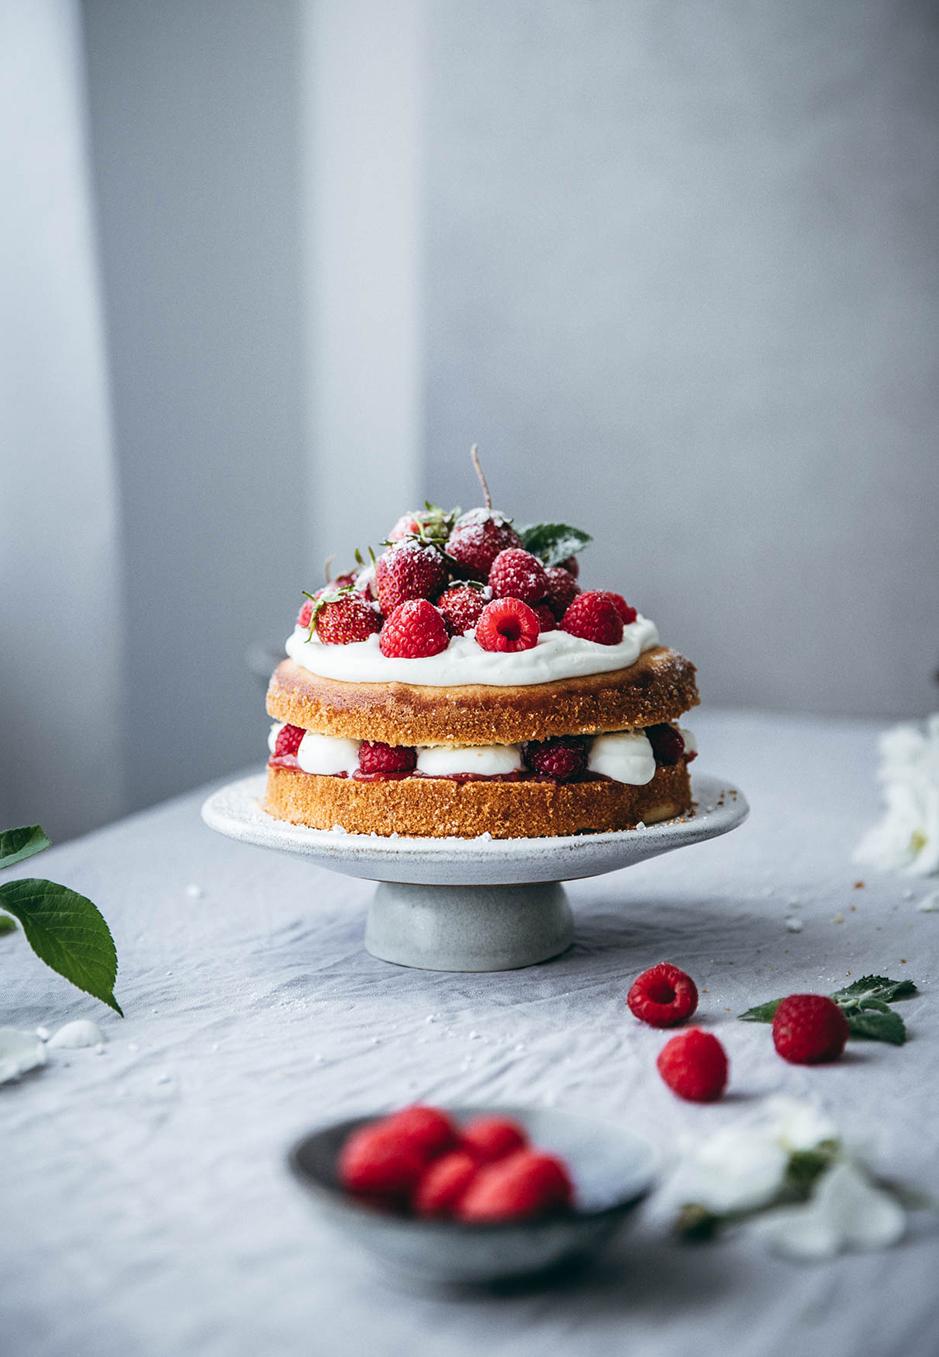 Aus Biskuit kannst du Victoria Sponge Cake zauberrrrrrrrrrrrrrrrrn